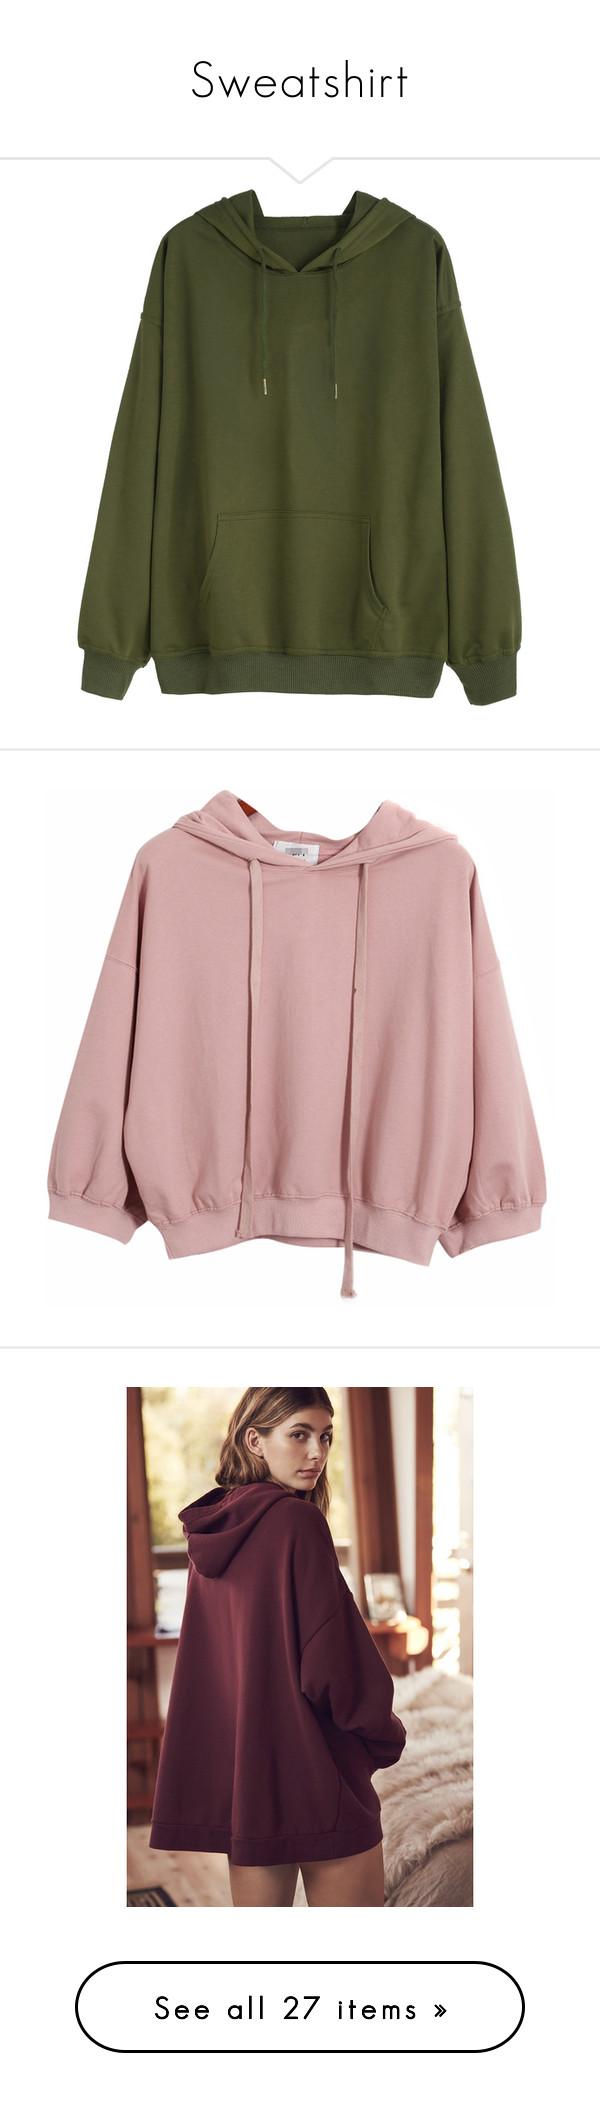 """Sweatshirt"" by raenawallace ❤ liked on Polyvore featuring tops, hoodies, sweatshirts, sweaters, outerwear, sweatshirt, jumpers, green, long sleeve sweatshirt and hooded sweatshirt"